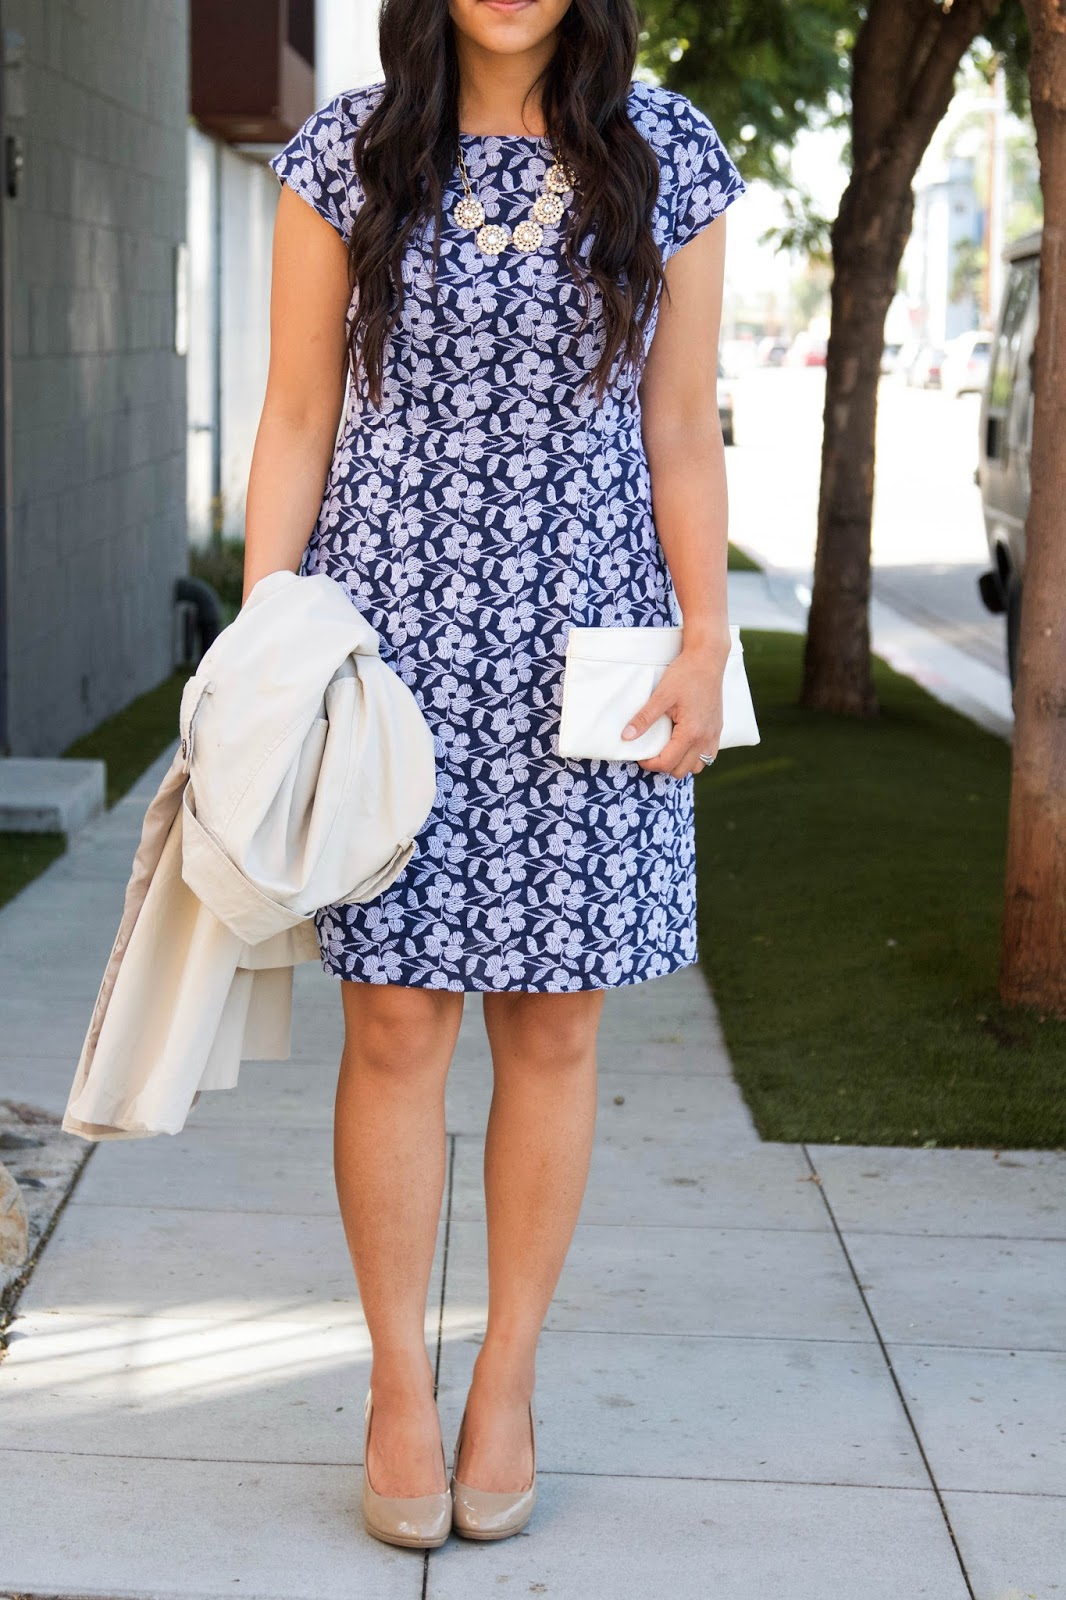 Blue Floral Dress + Statement Necklace + white clutch